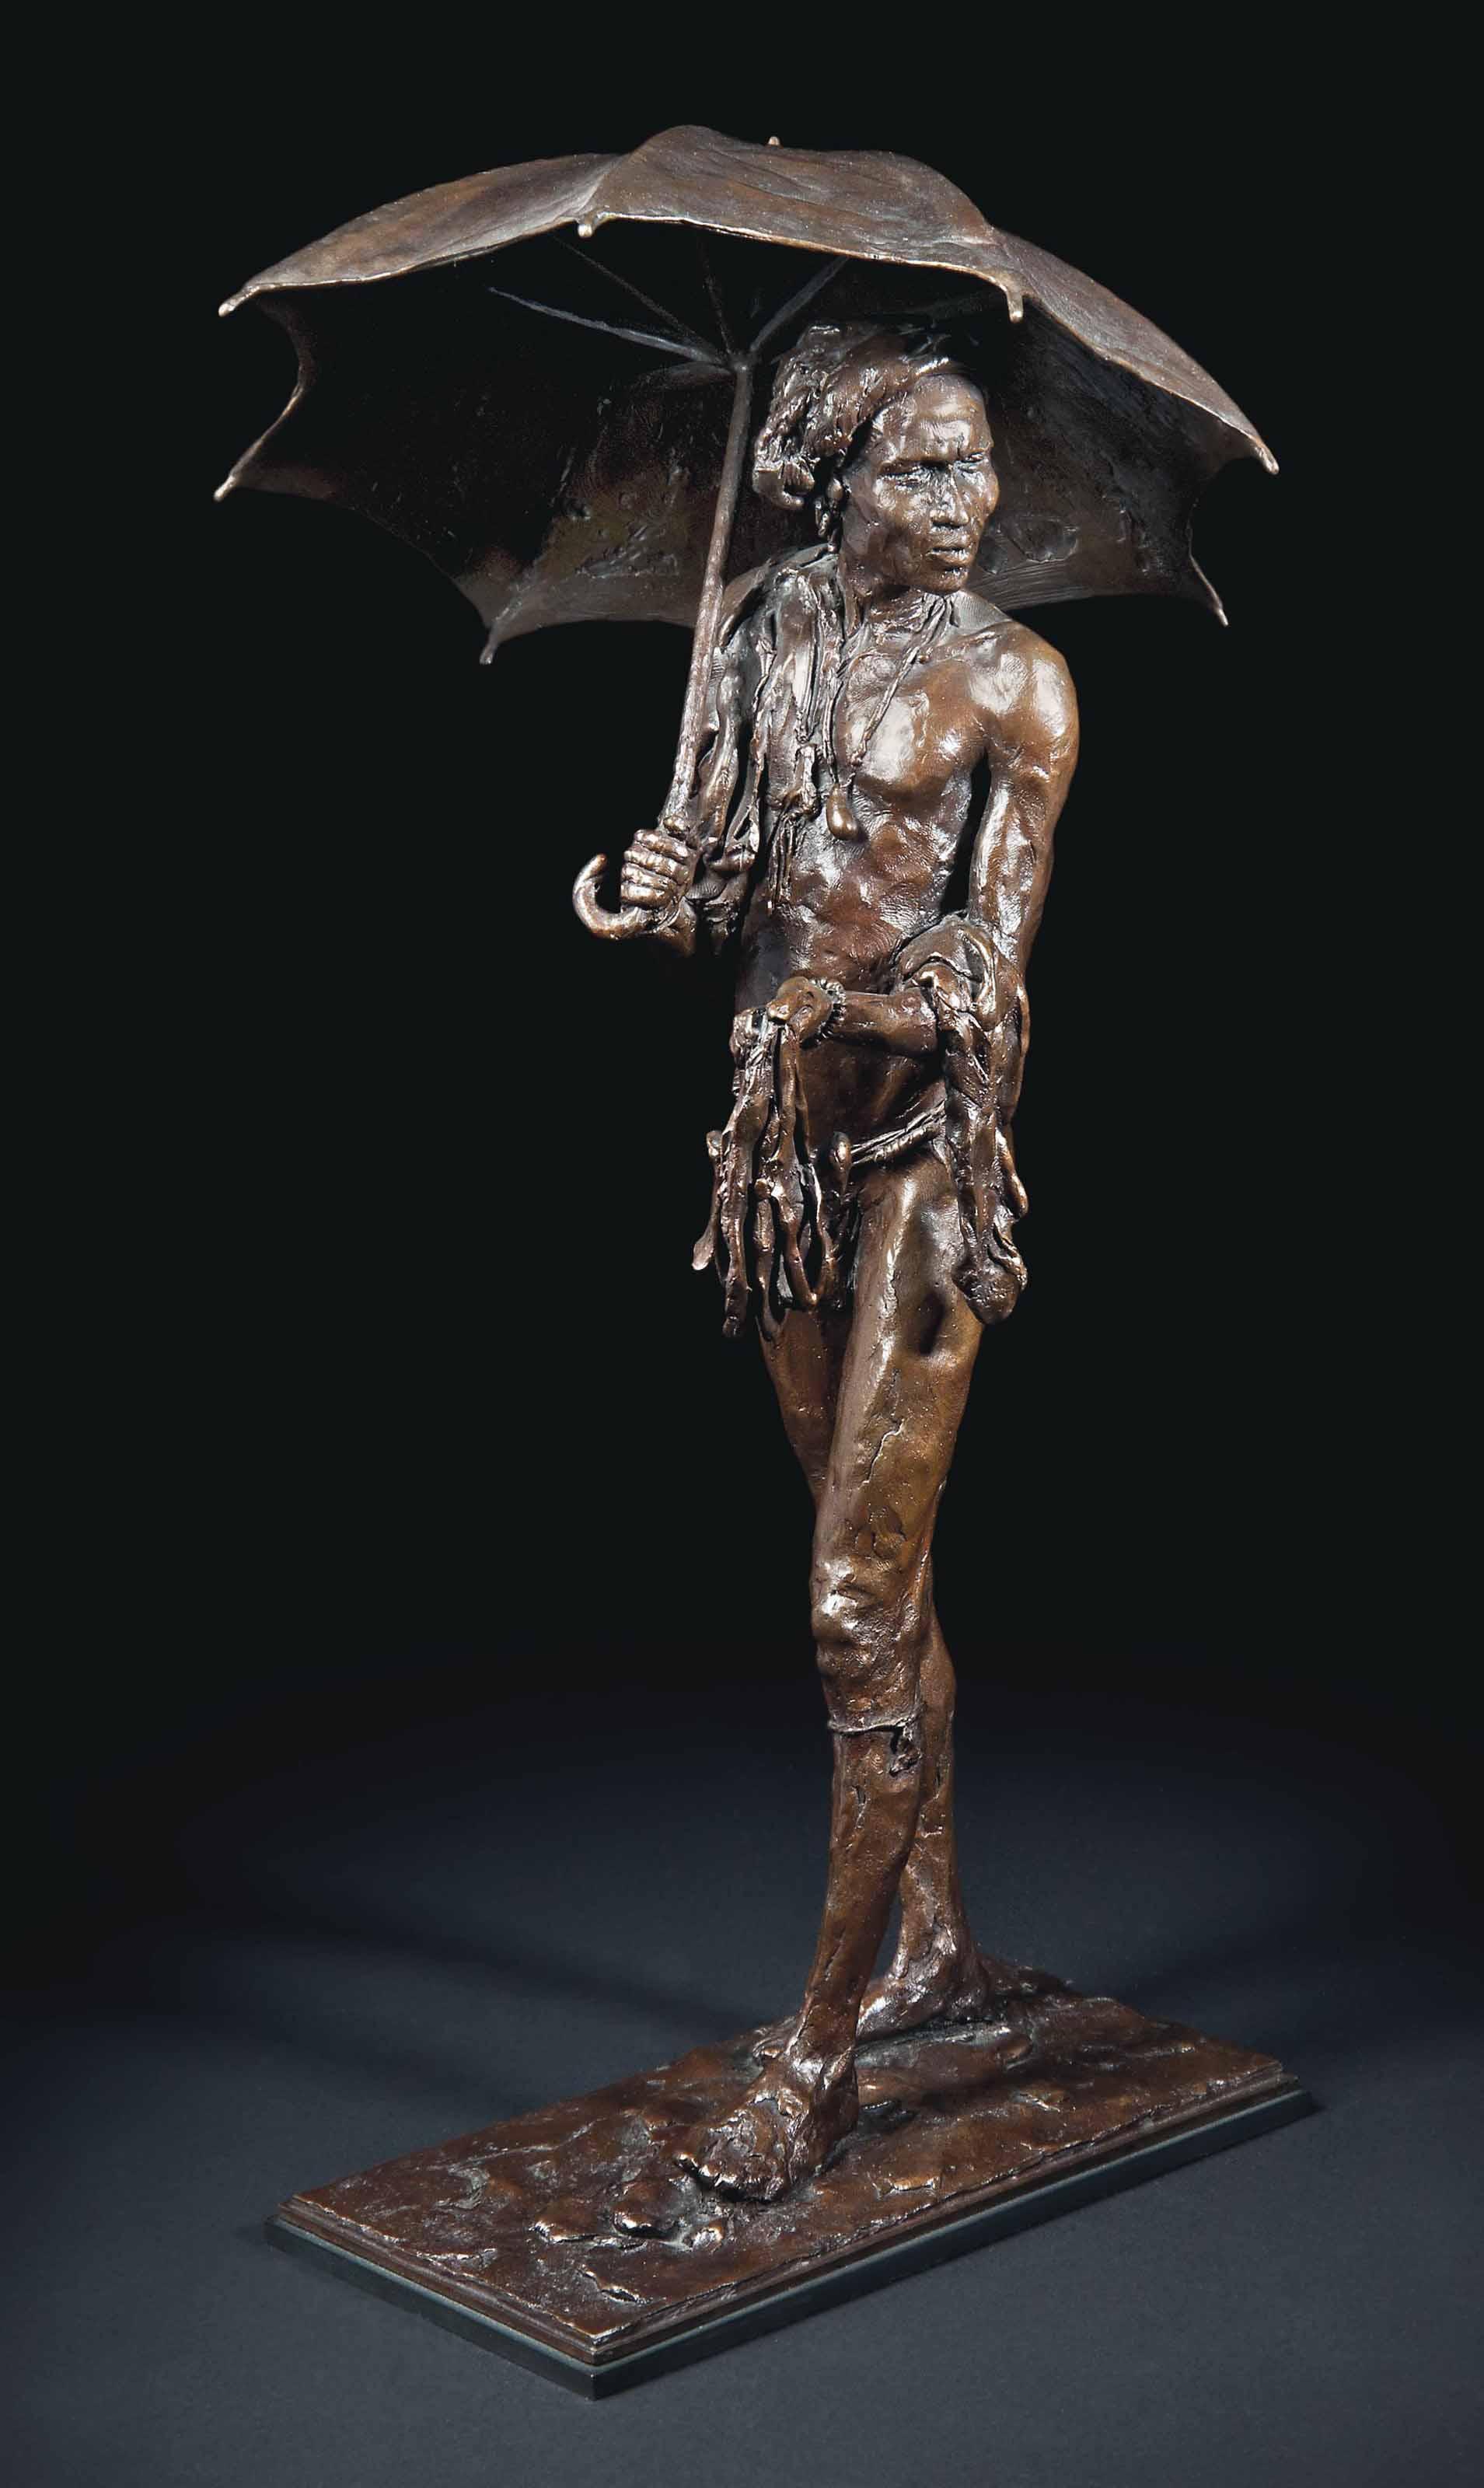 Tribesman with Umbrella